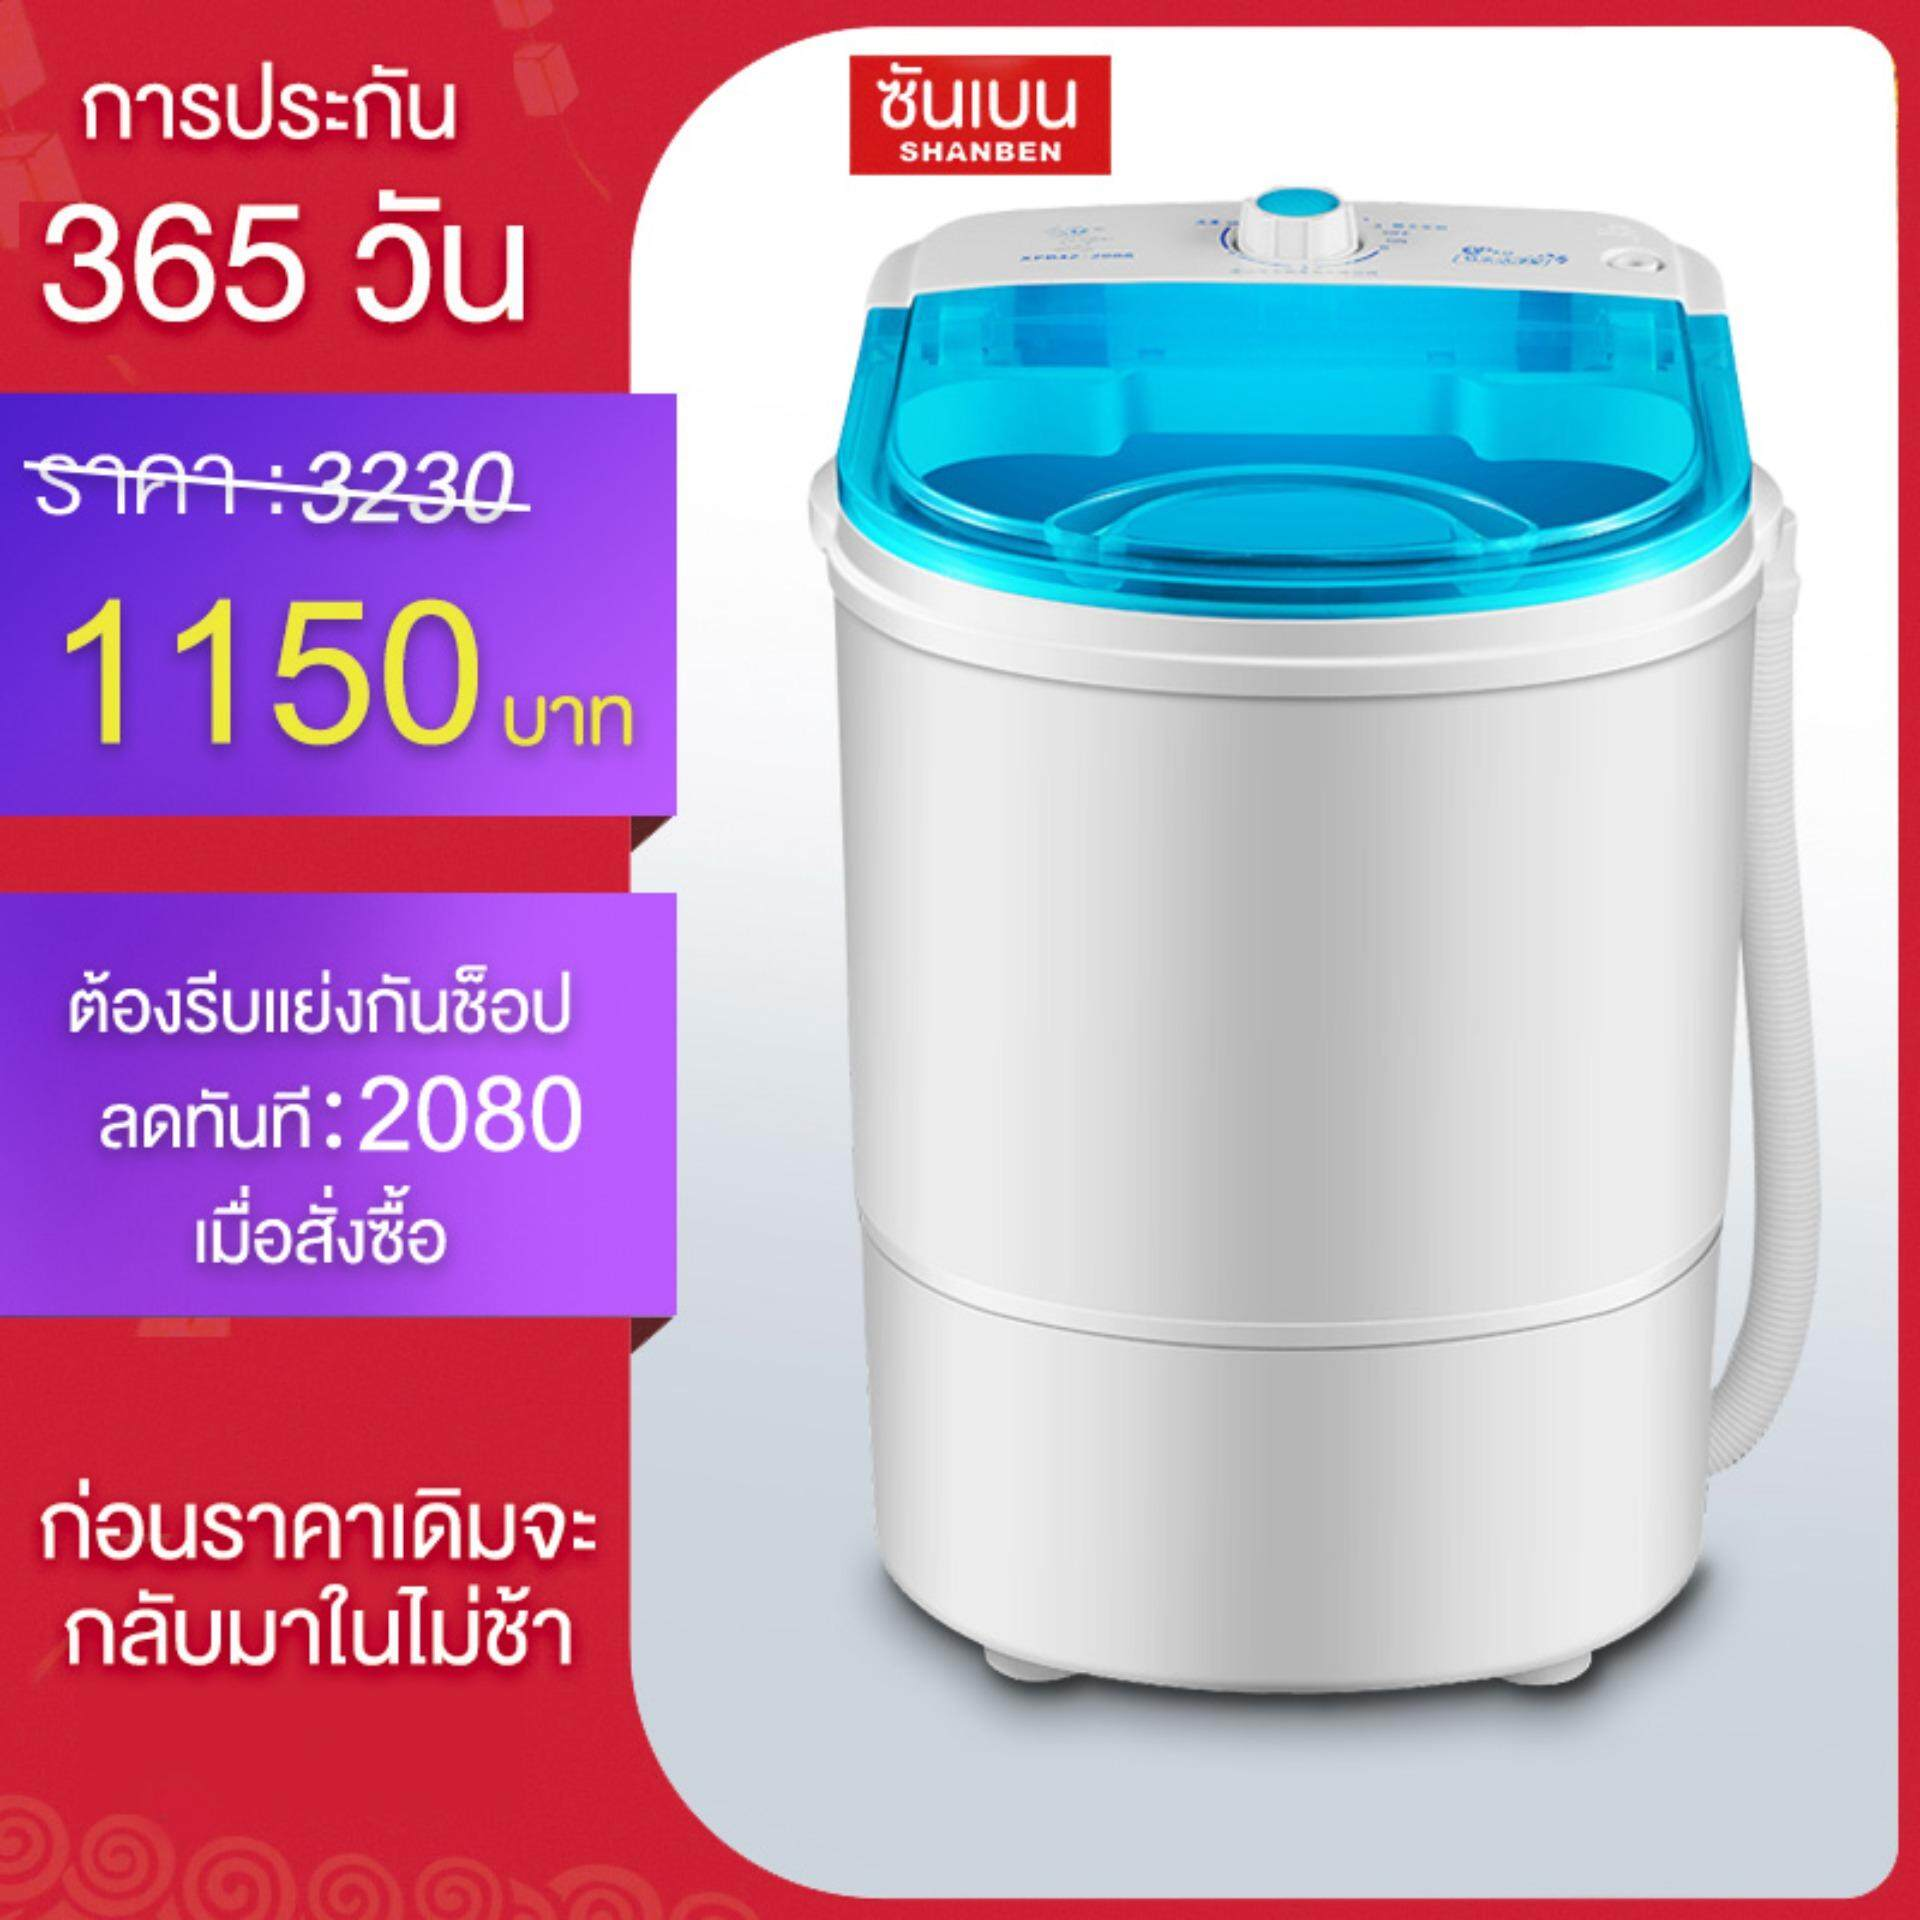 Shanbenเครื่องซักผ้ามินิฝาบน ขนาด 4.5 Kg ฟังก์ชั่น 2 In 1 ซักและปั่นแห้งในตัวเดียวกัน ประหยัดน้ำและพลังงาน Duckling Mini Washing Machine.